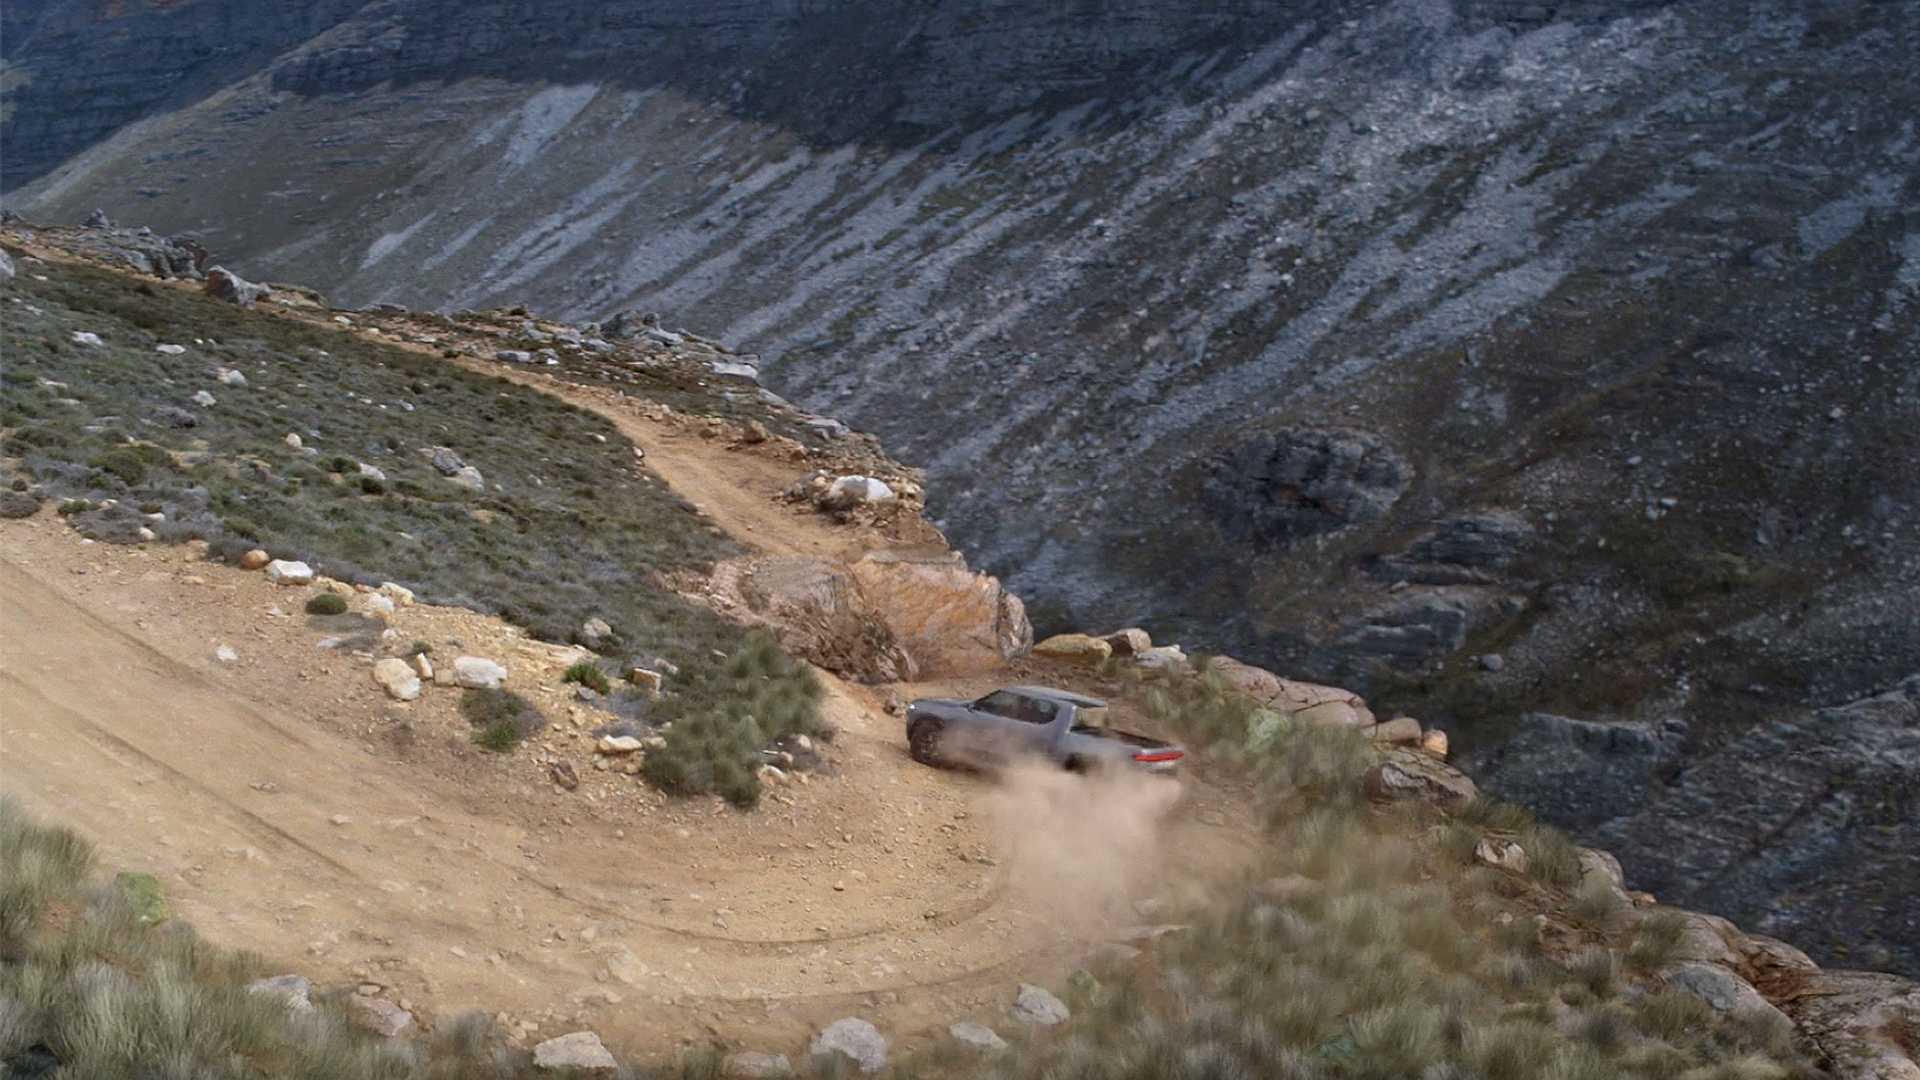 Watch Rivian R1T Pickup Truck Perform Tank-Like Zero-Radius Turn